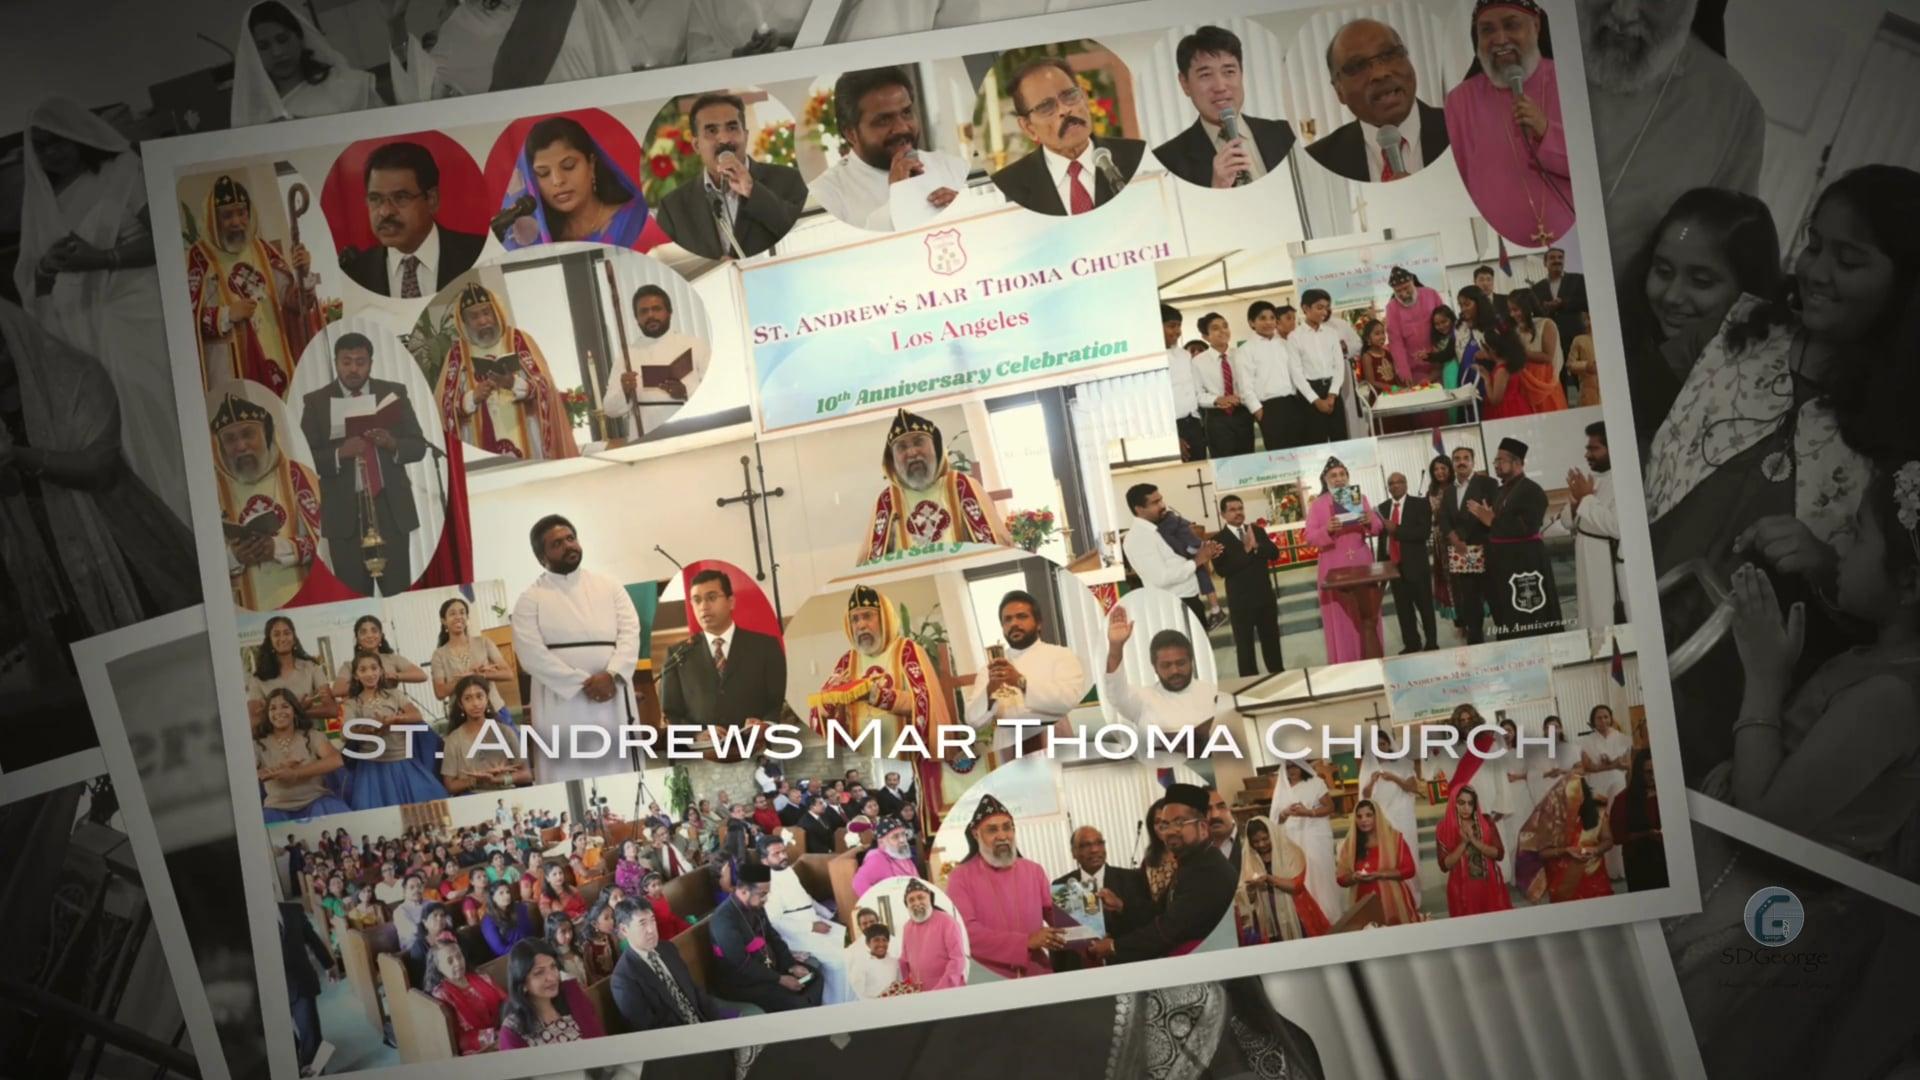 St Andrews Mar Thoma Church 10th Anniversary Service & Celebration